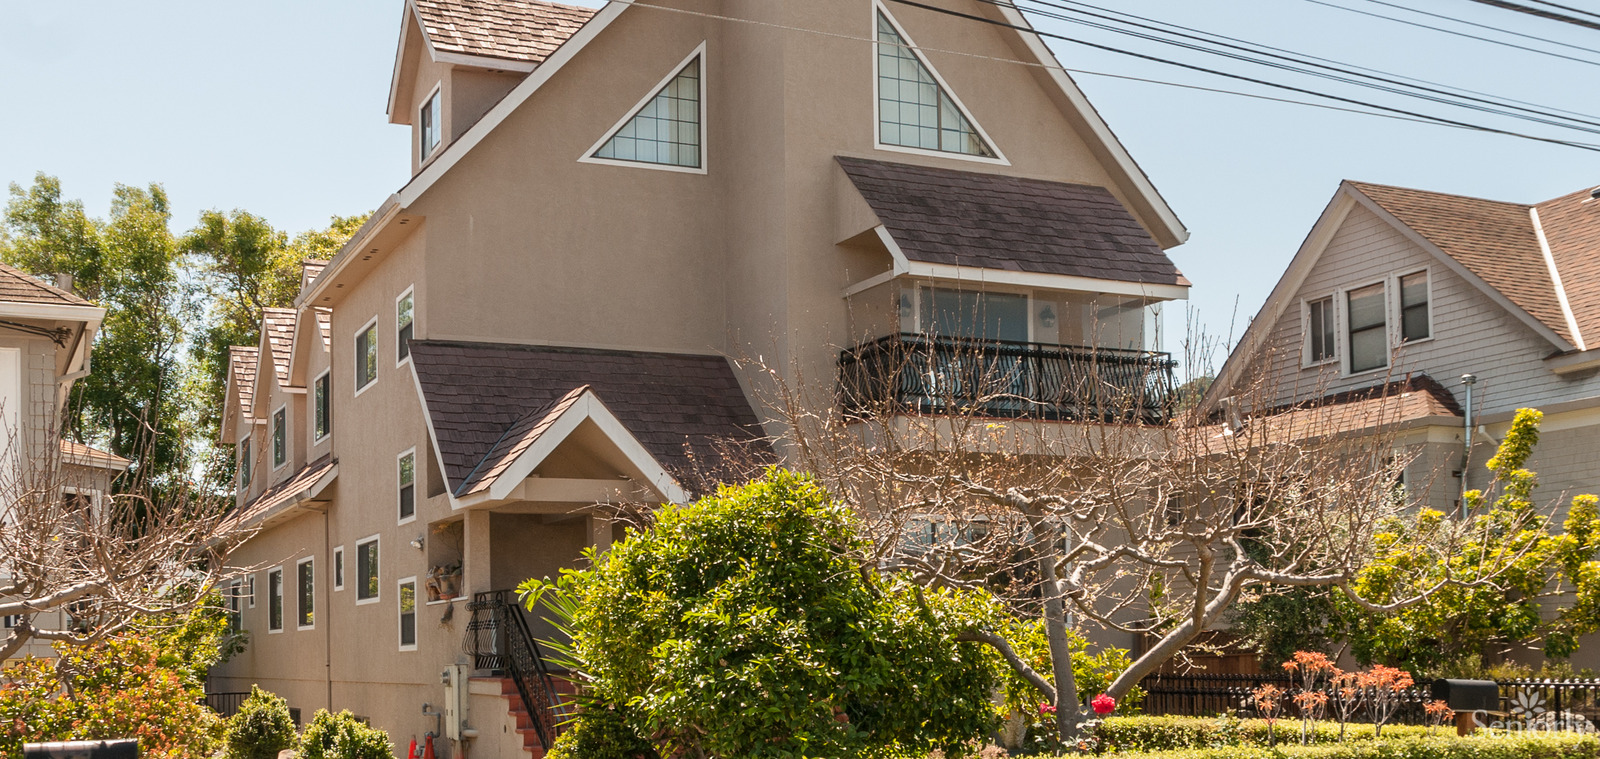 B&B Residential Facilities (15 W)